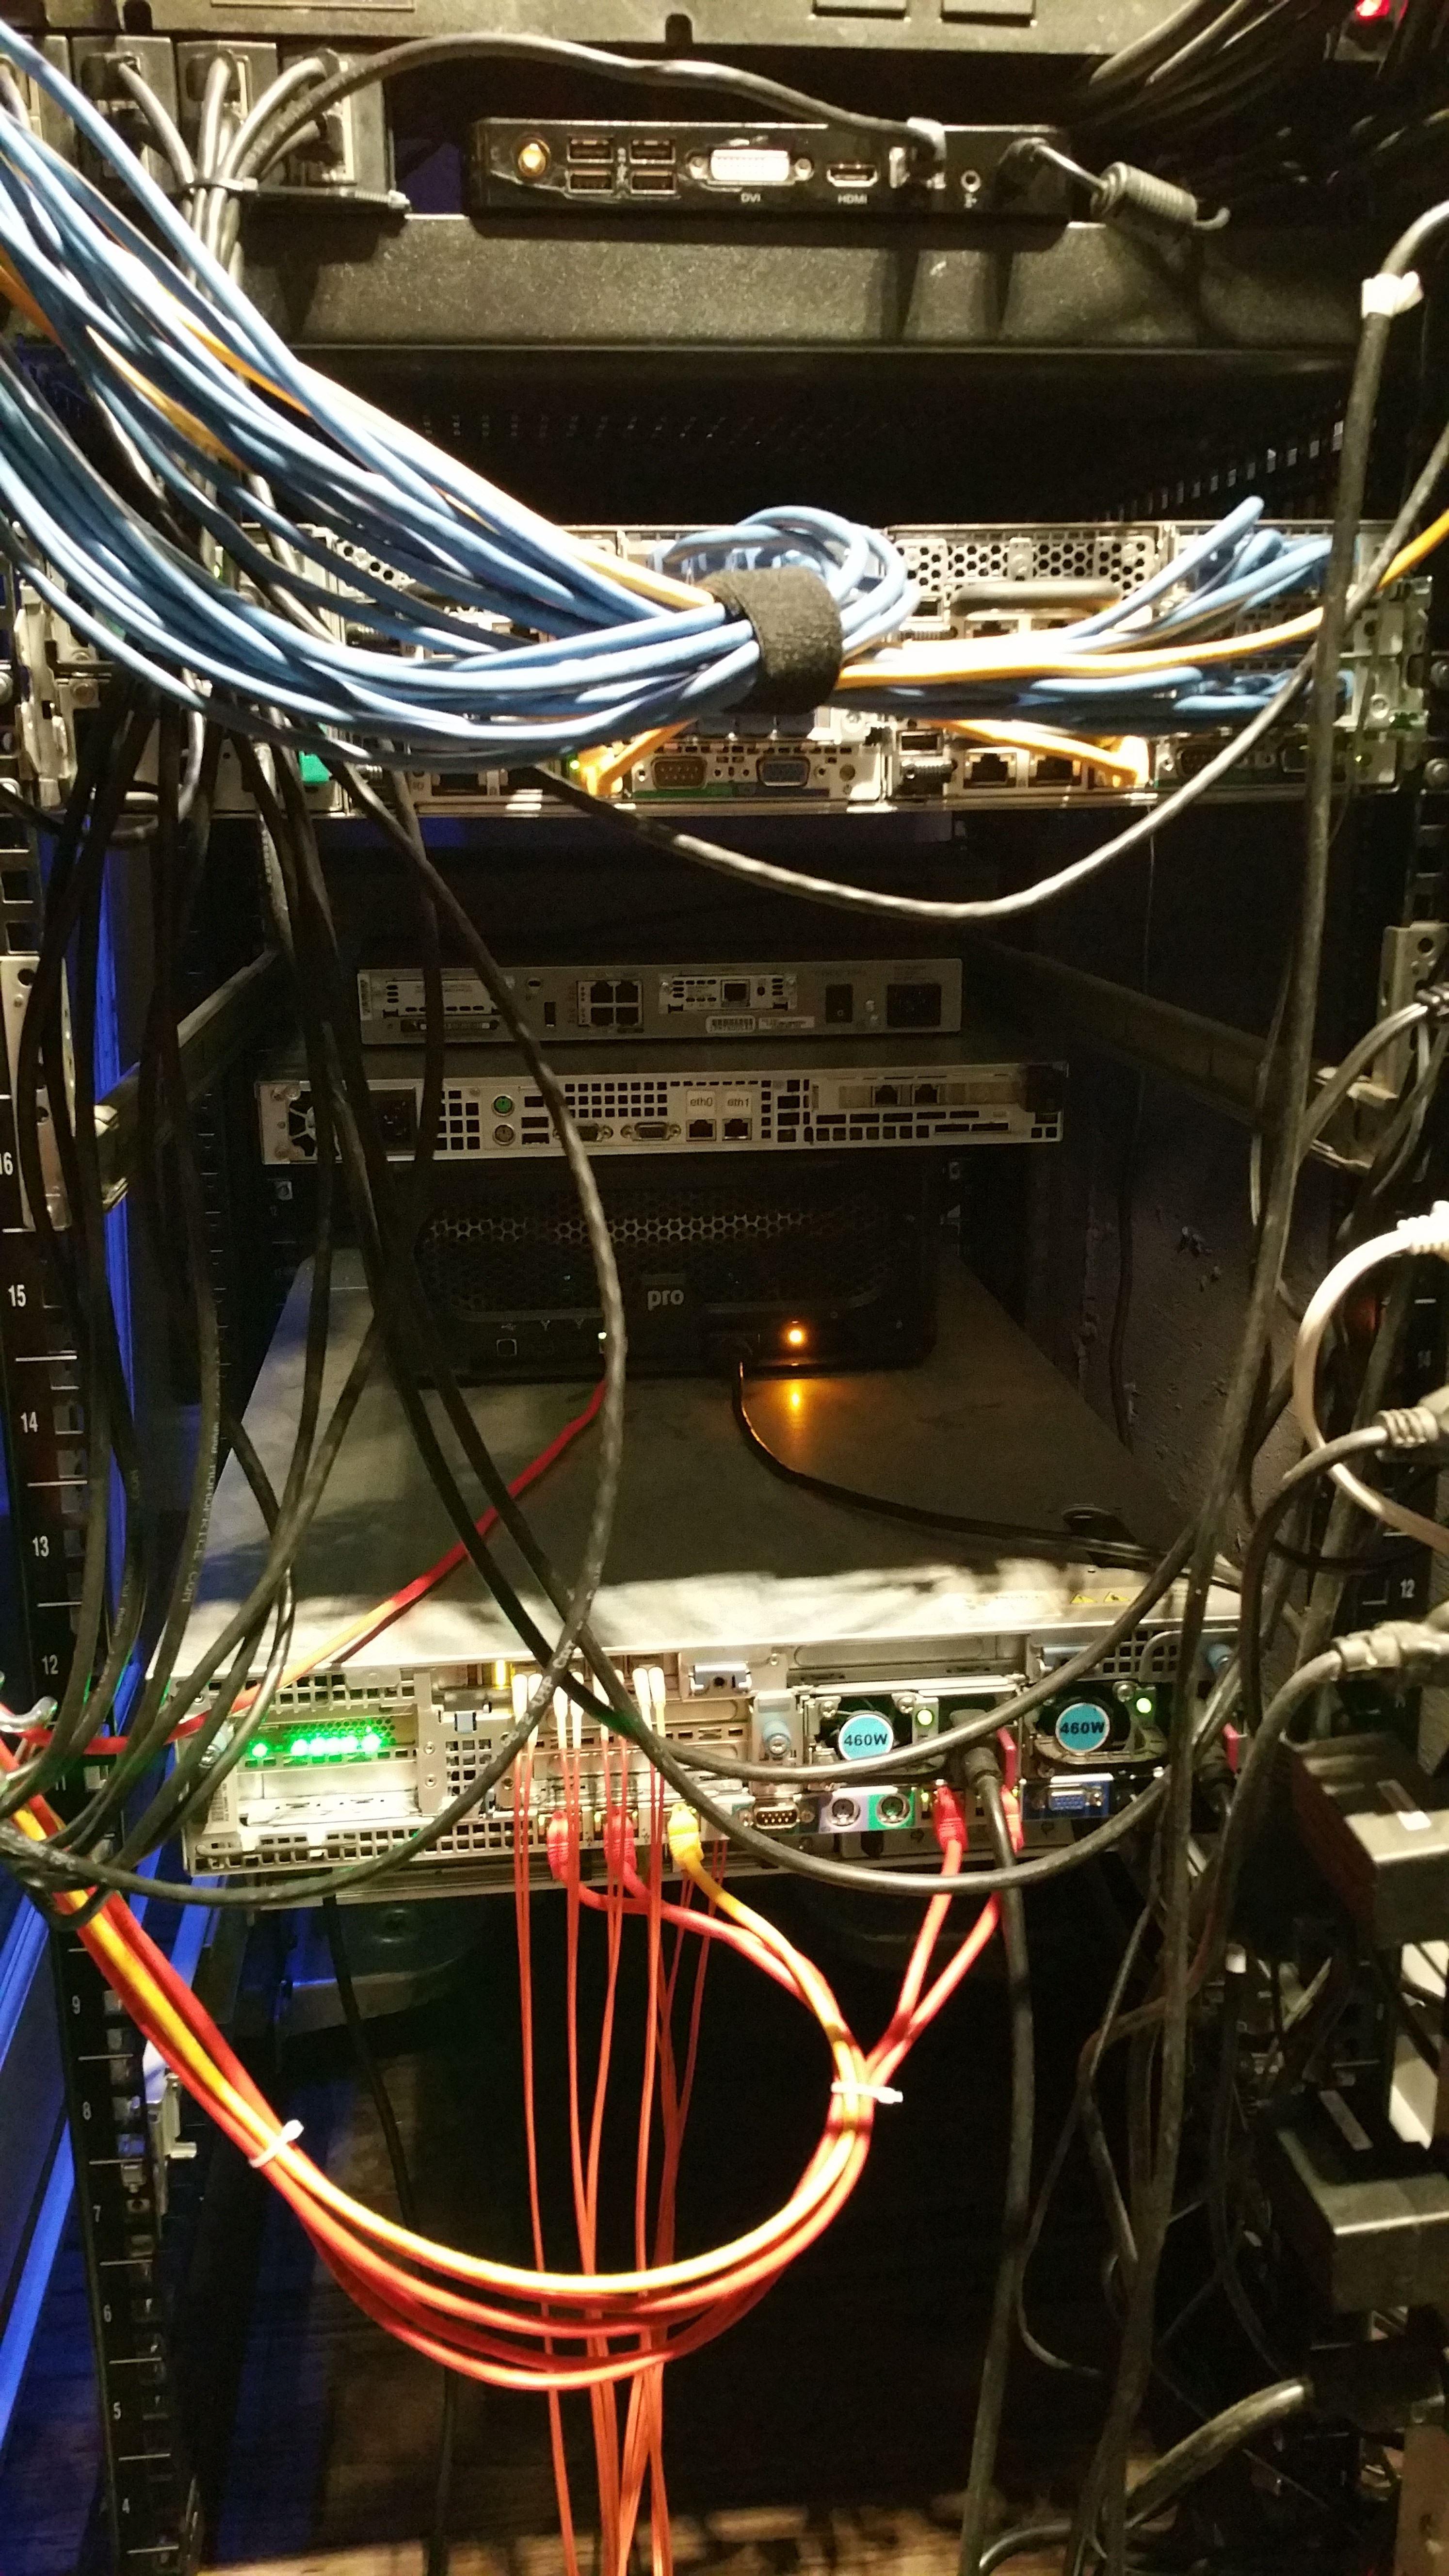 Home Server Room Build – Gonzalo Escarrá's Blog